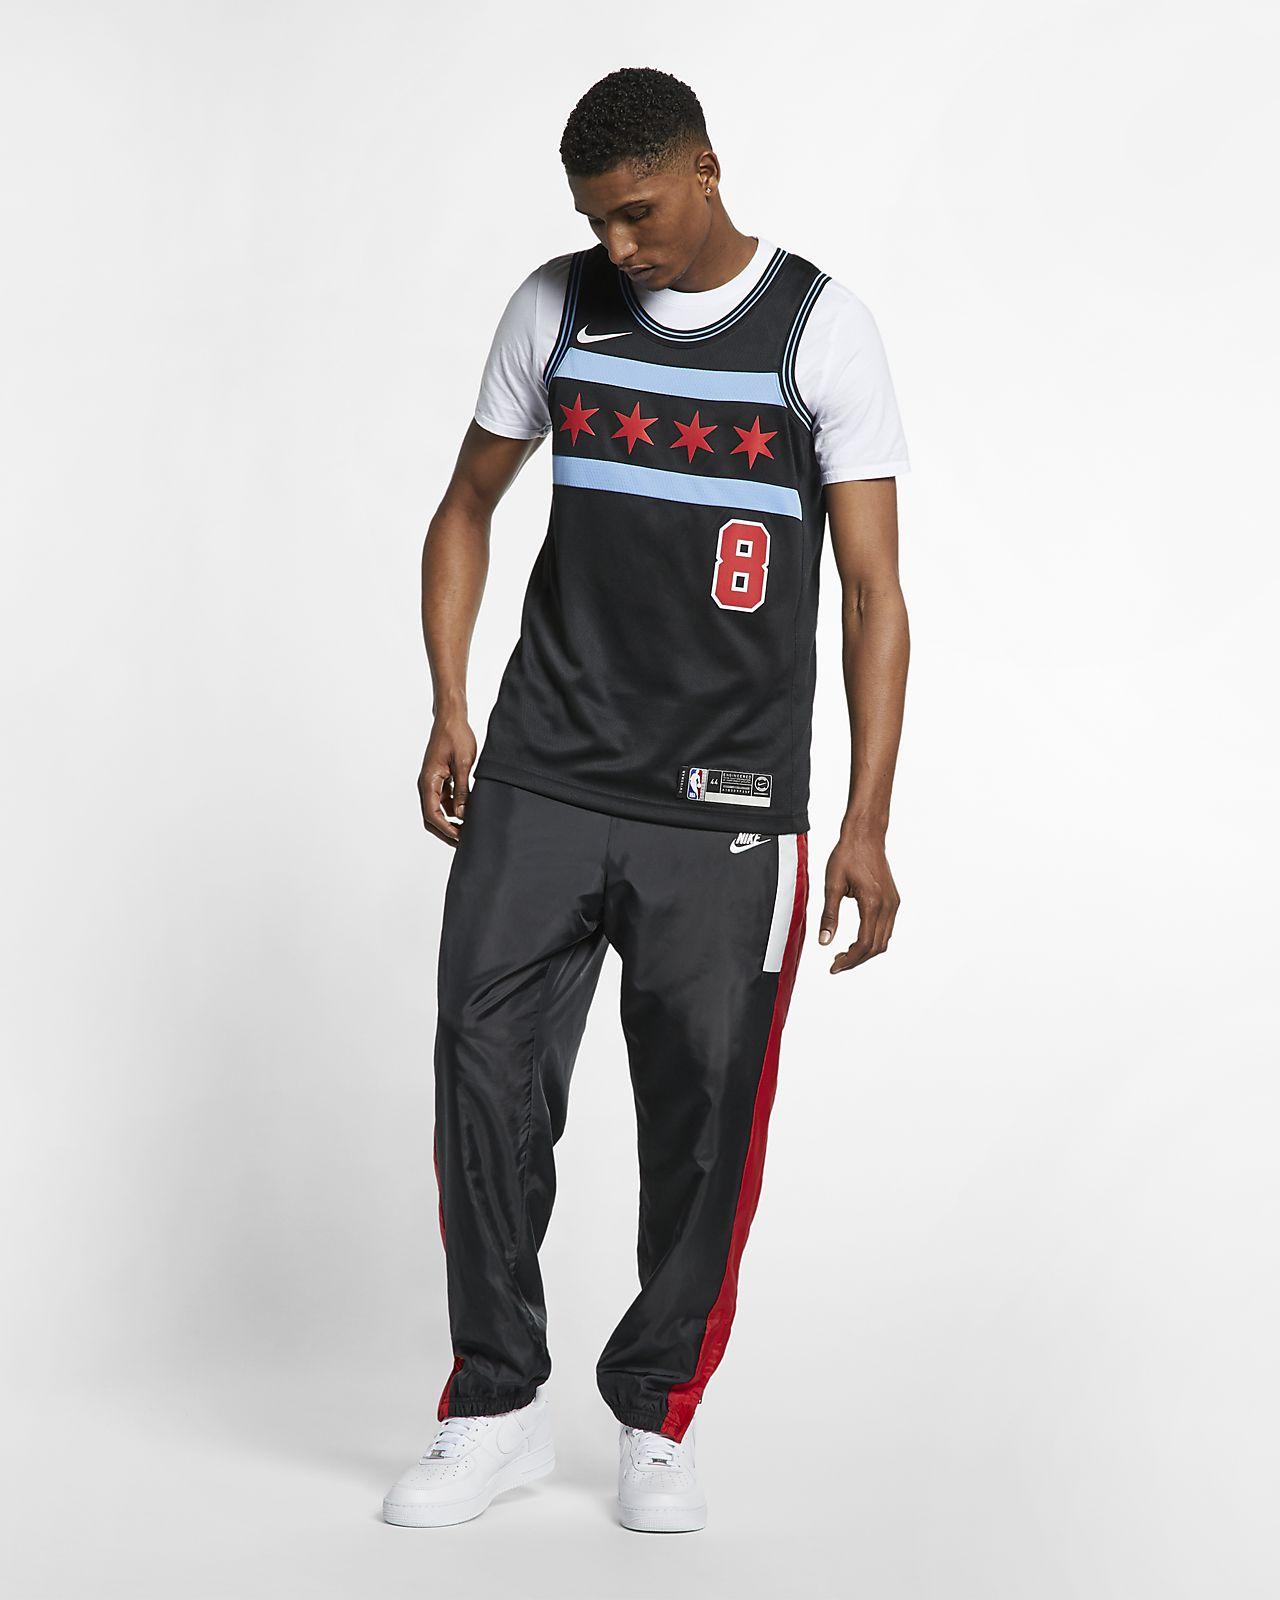 77afc3a7 ... Zach LaVine City Edition Swingman (Chicago Bulls) Men's Nike NBA  Connected Jersey